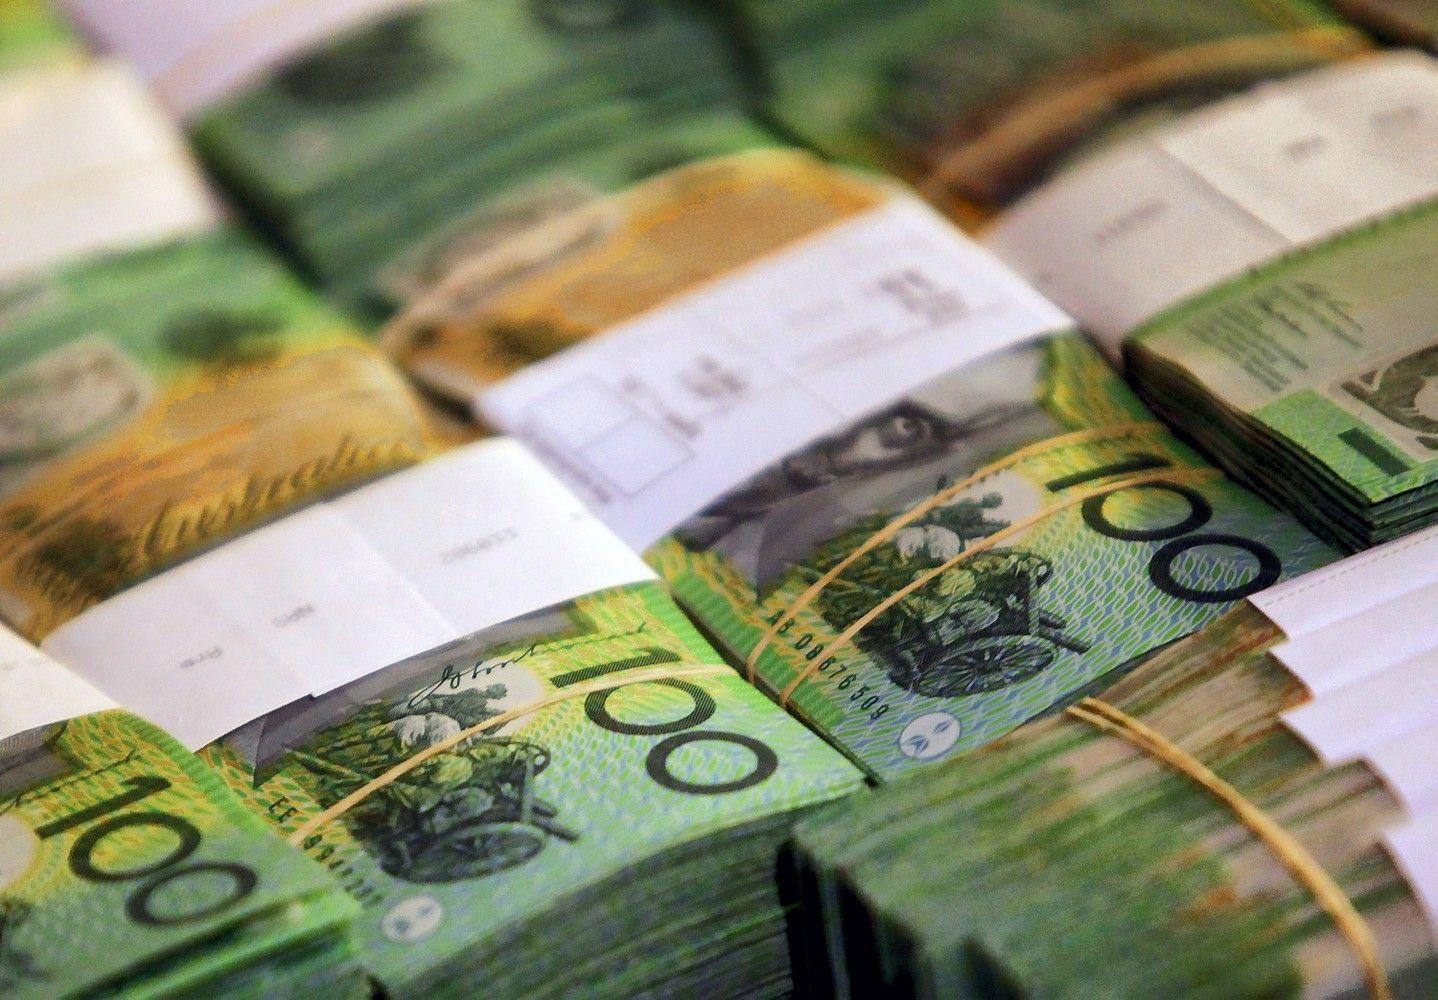 Aussie Drops in Listless Asia Trading; Stocks Flat: Markets Wrap